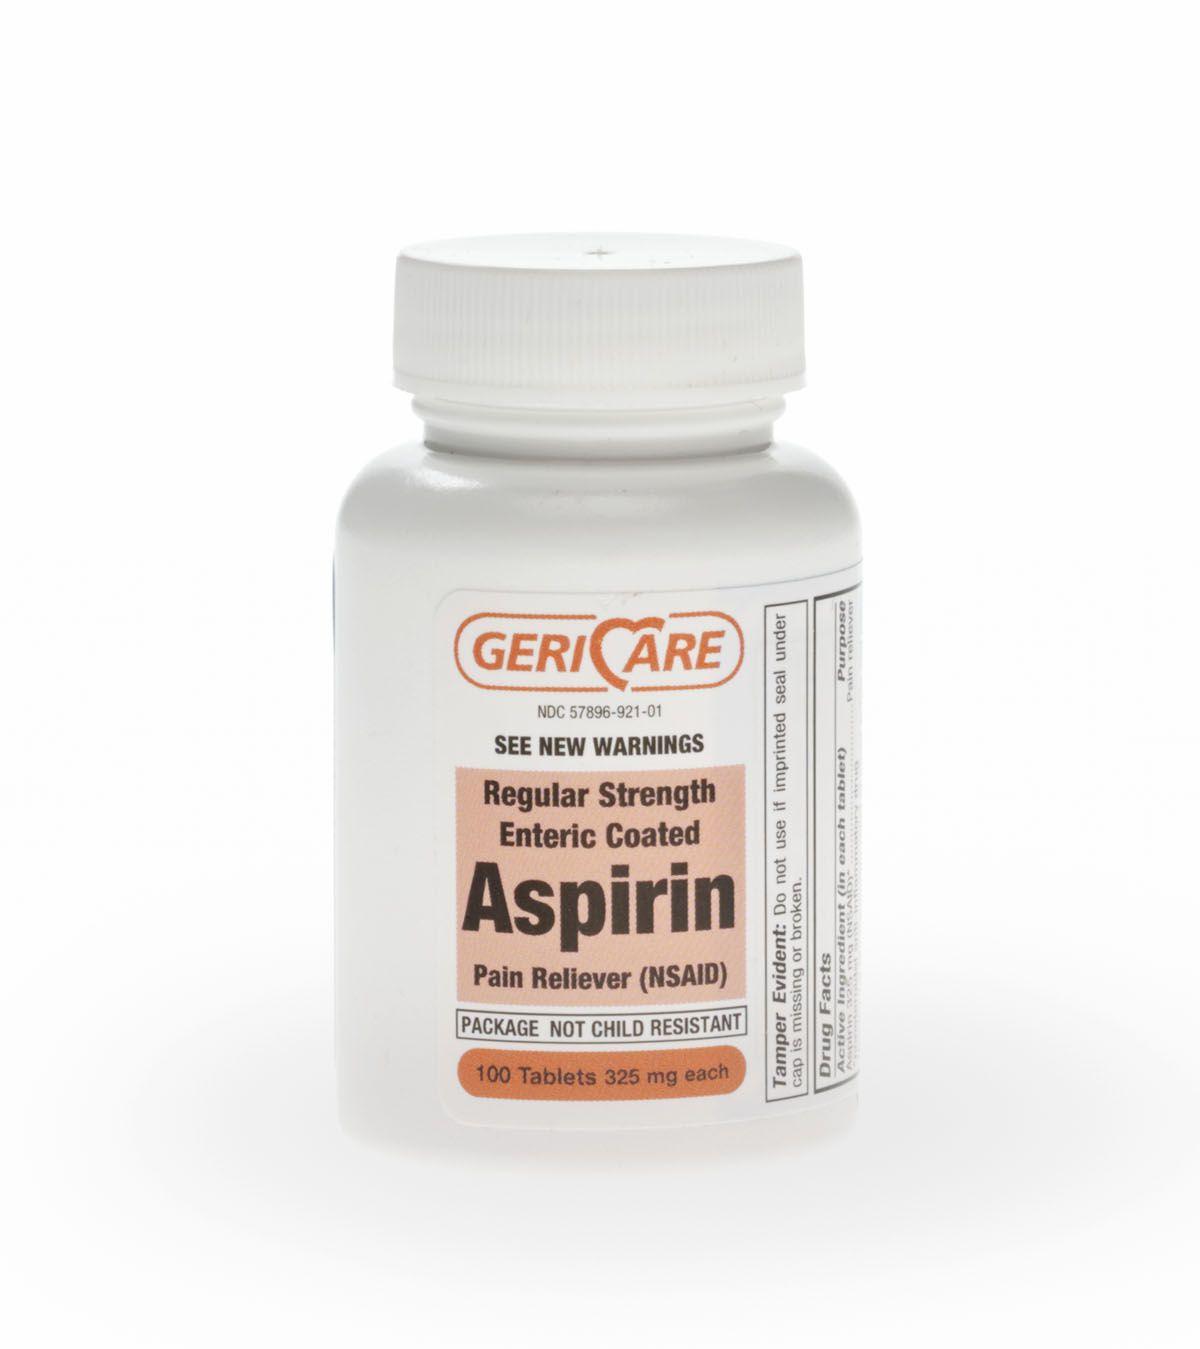 Generic OTC Aspirin Enteric Coated Tablet - Aspirin Ec 325Mg Tab 100/Bt, Each - Model 92101